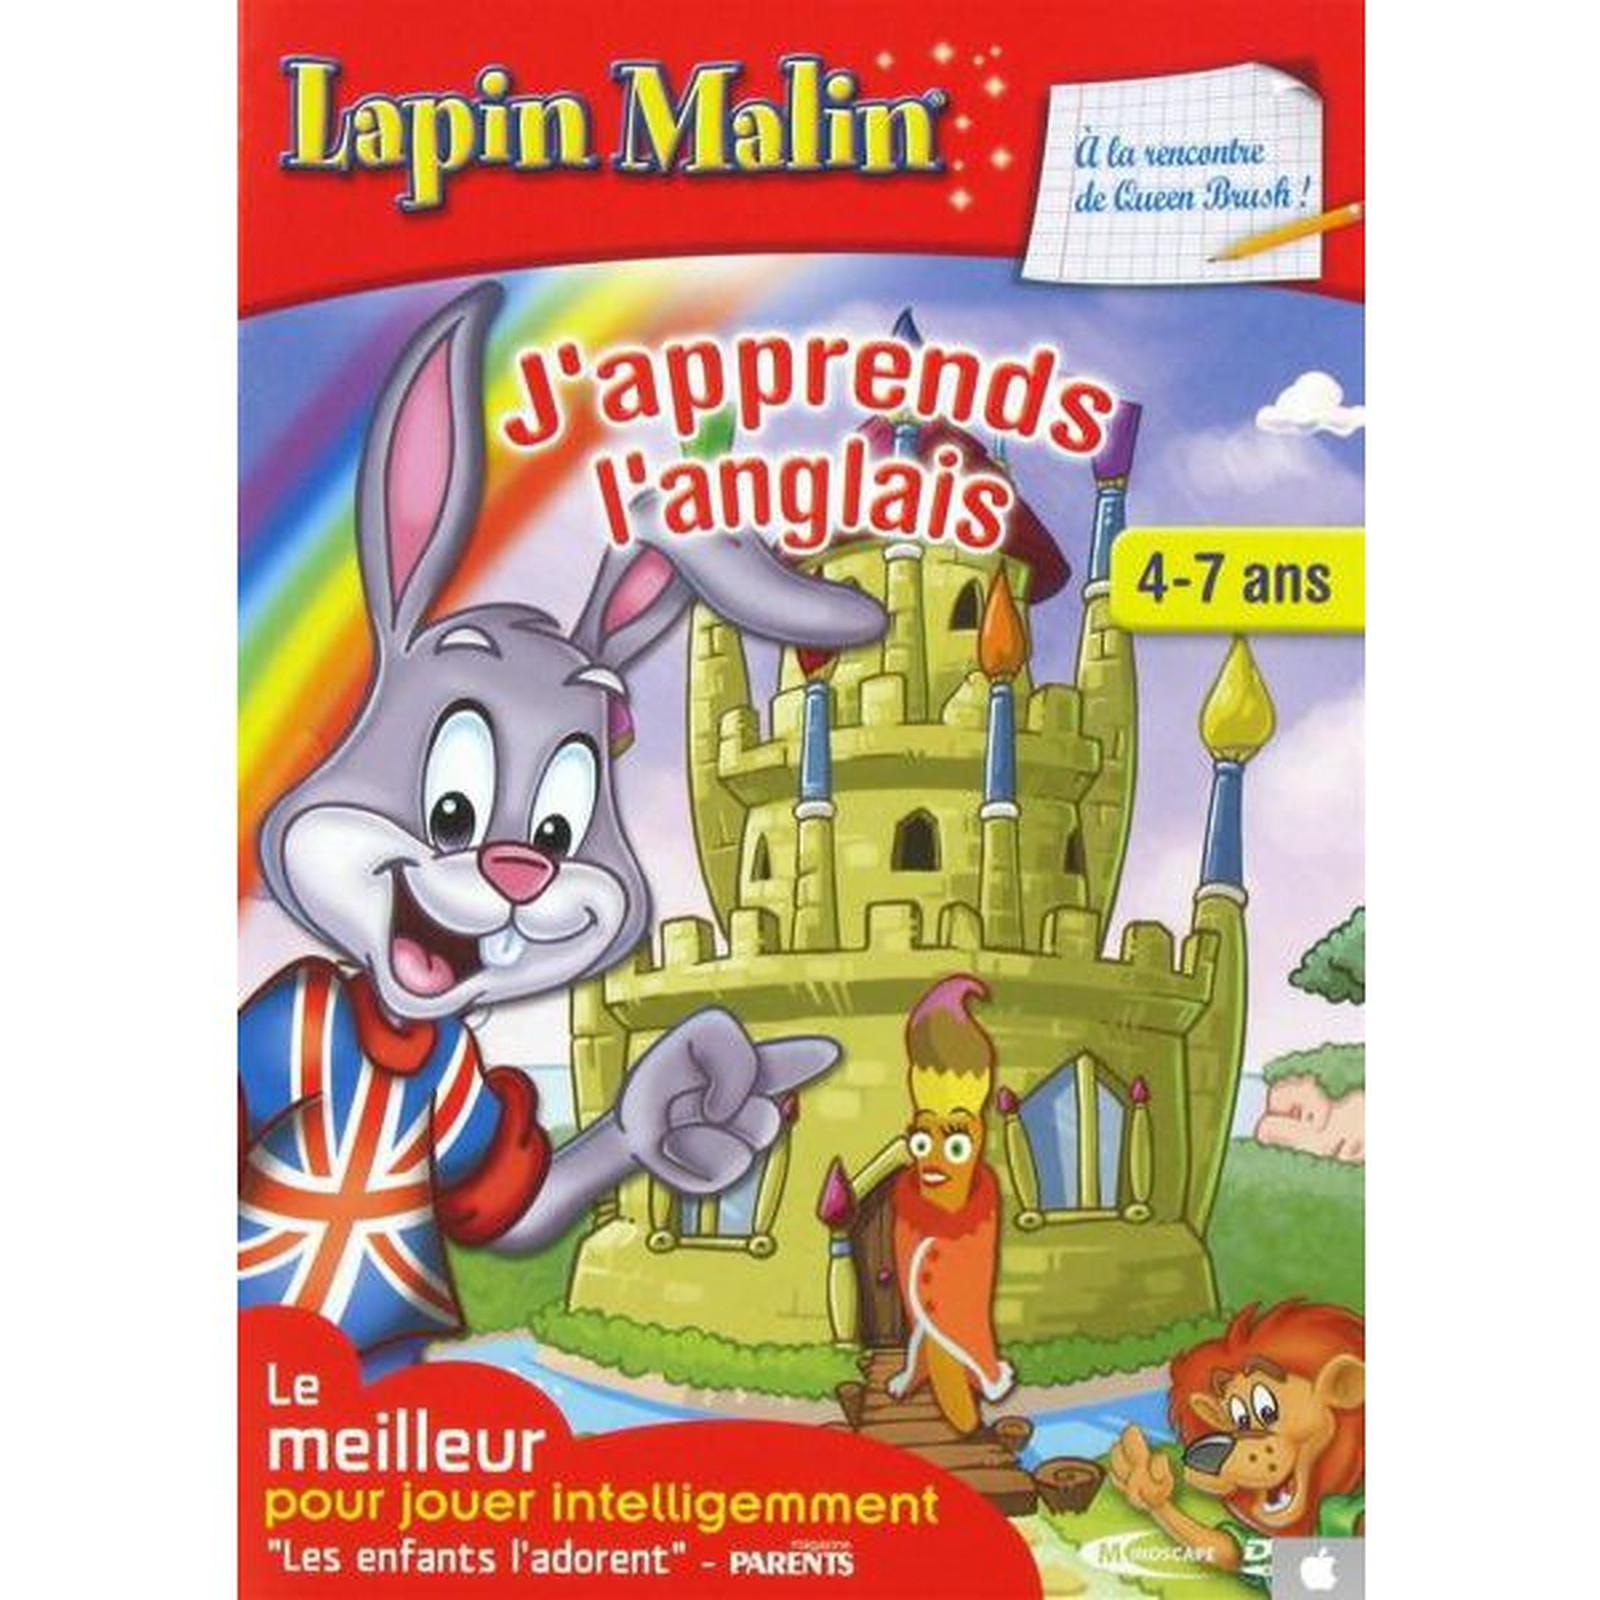 Lapin Malin - J'apprends L'anglais - 4/7 Ans (Pc) - Jeux Pc pour Jeu Pc Adibou